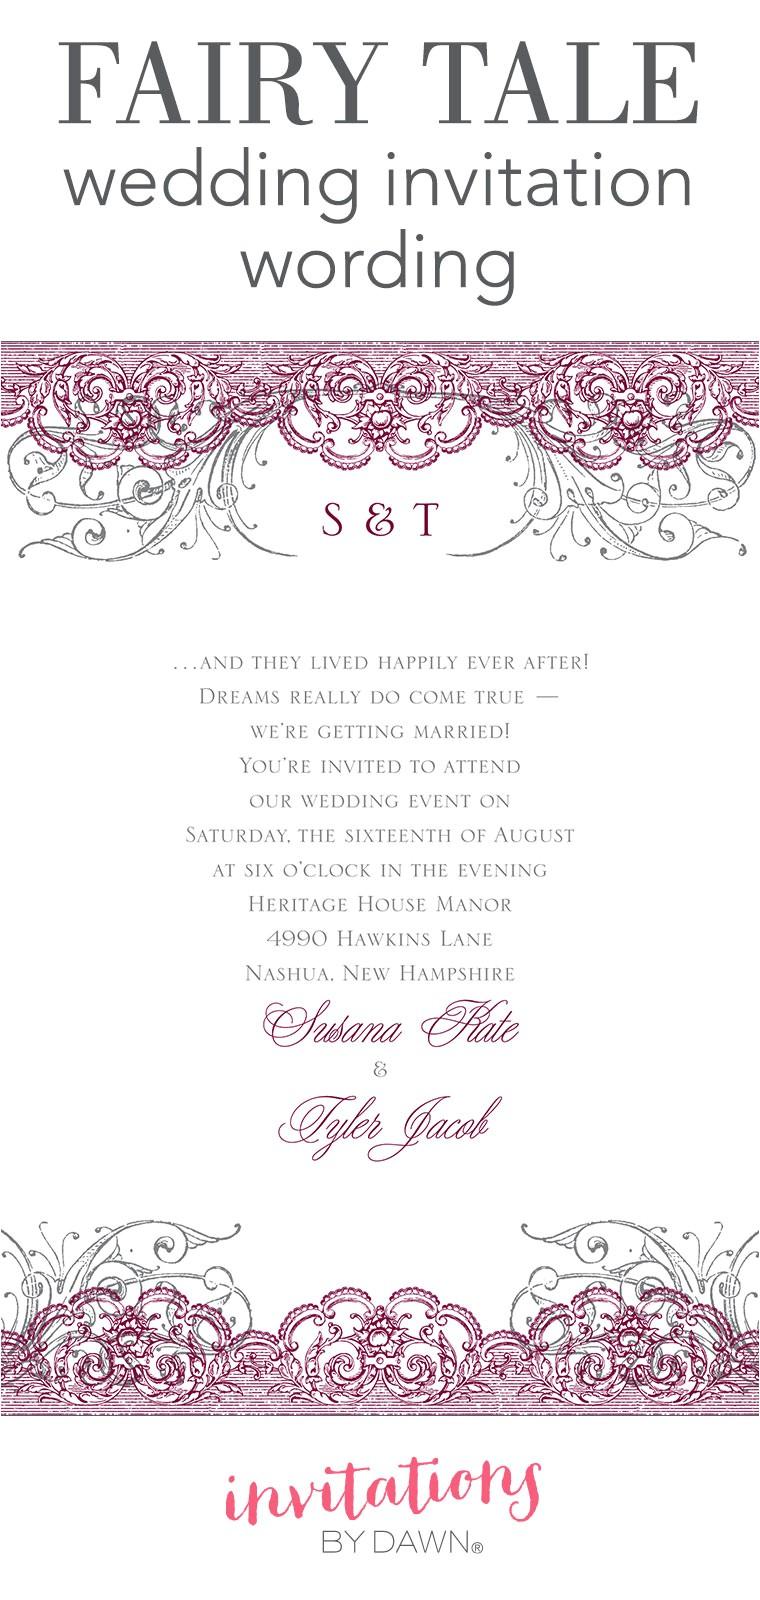 fairy tale wedding invitation wording